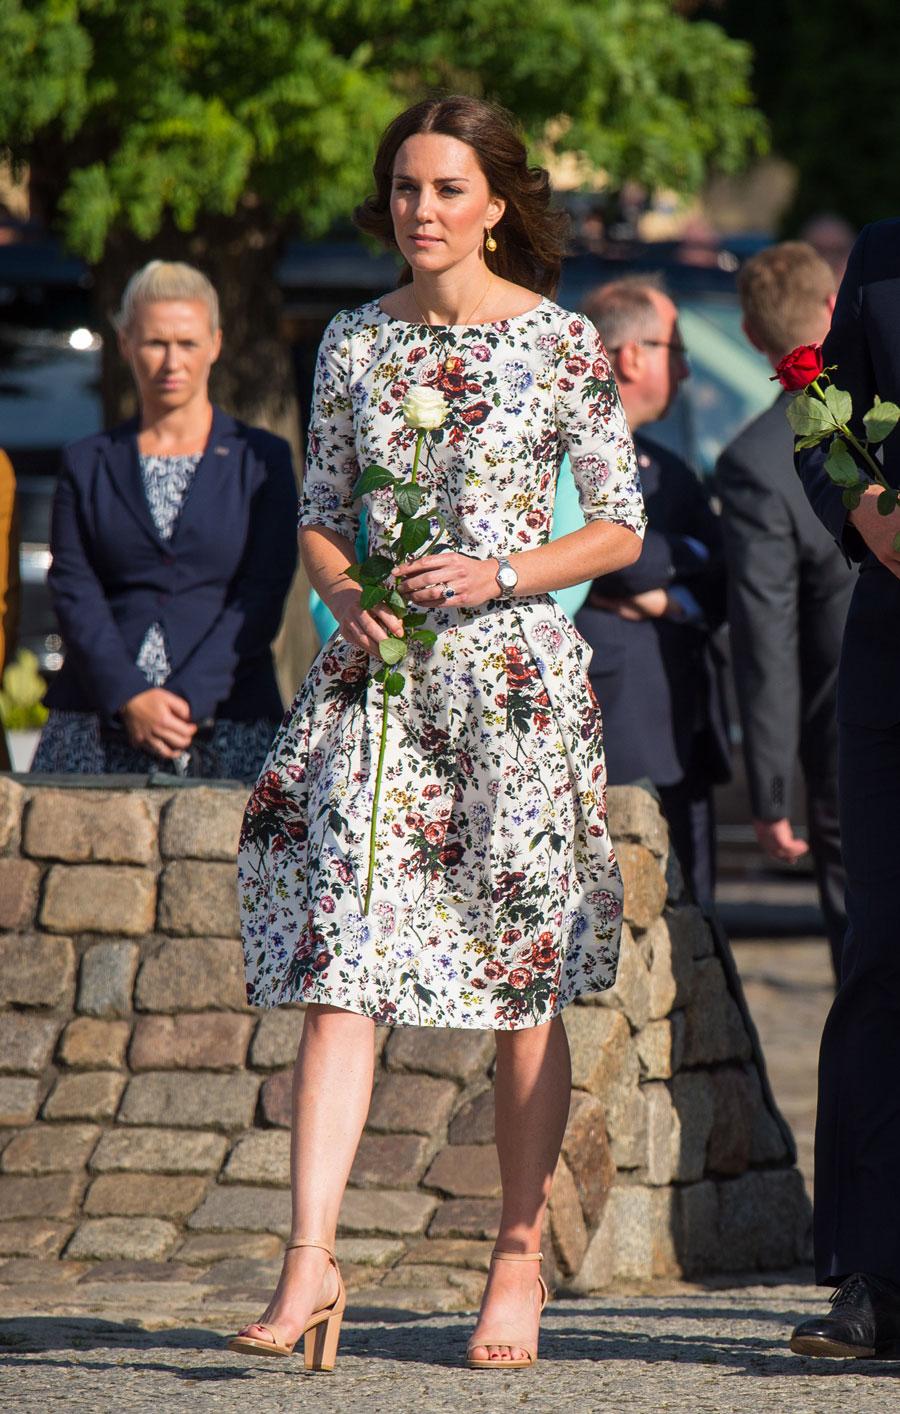 Fondo Flores Blanco Con Vestido Middleton Kate WqPBvXUg8